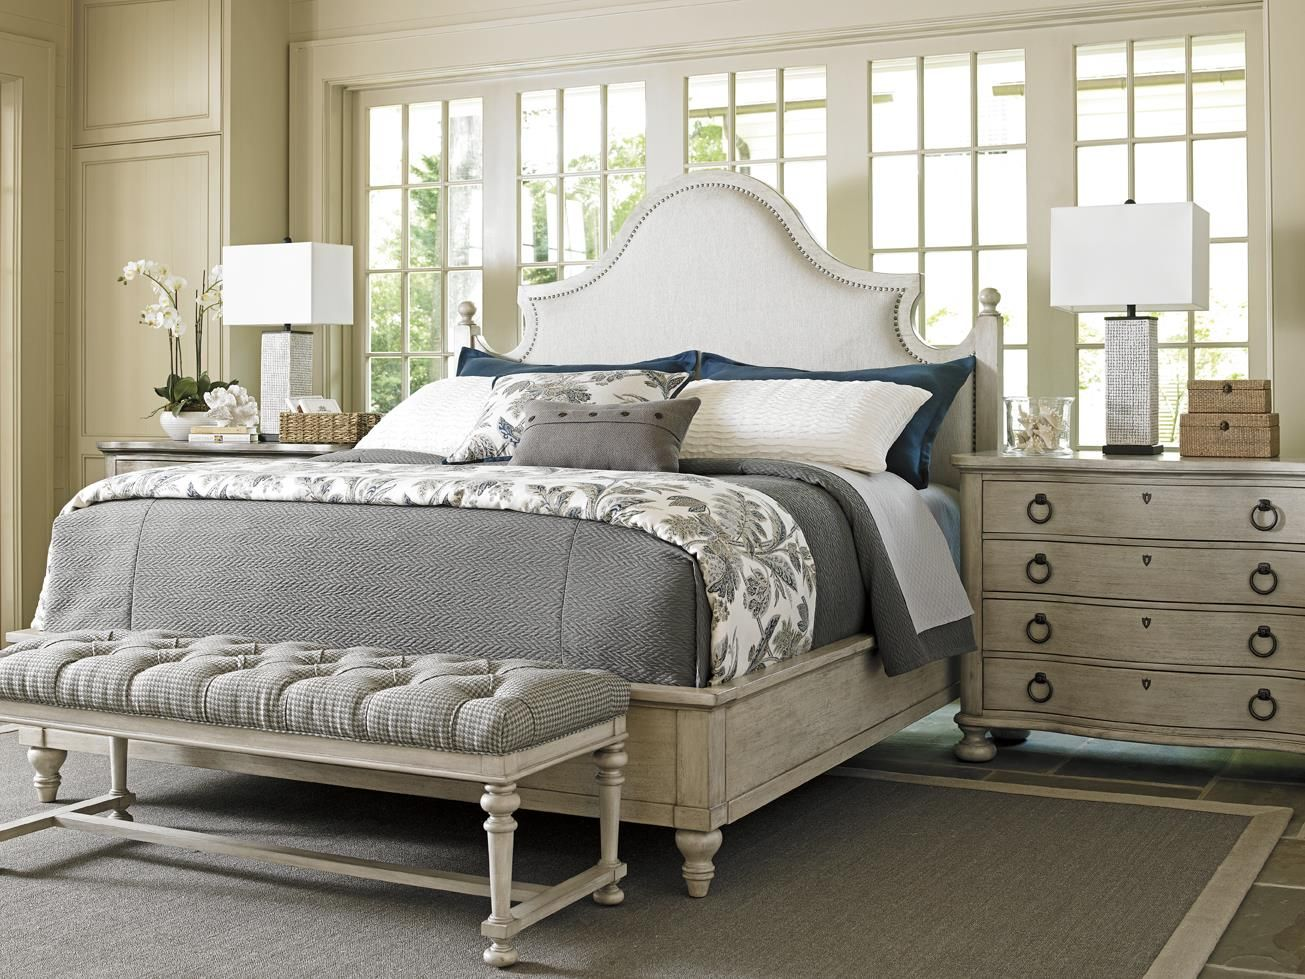 Lexington Oyster Bay Queen Bedroom Group | Baer\'s Furniture ...